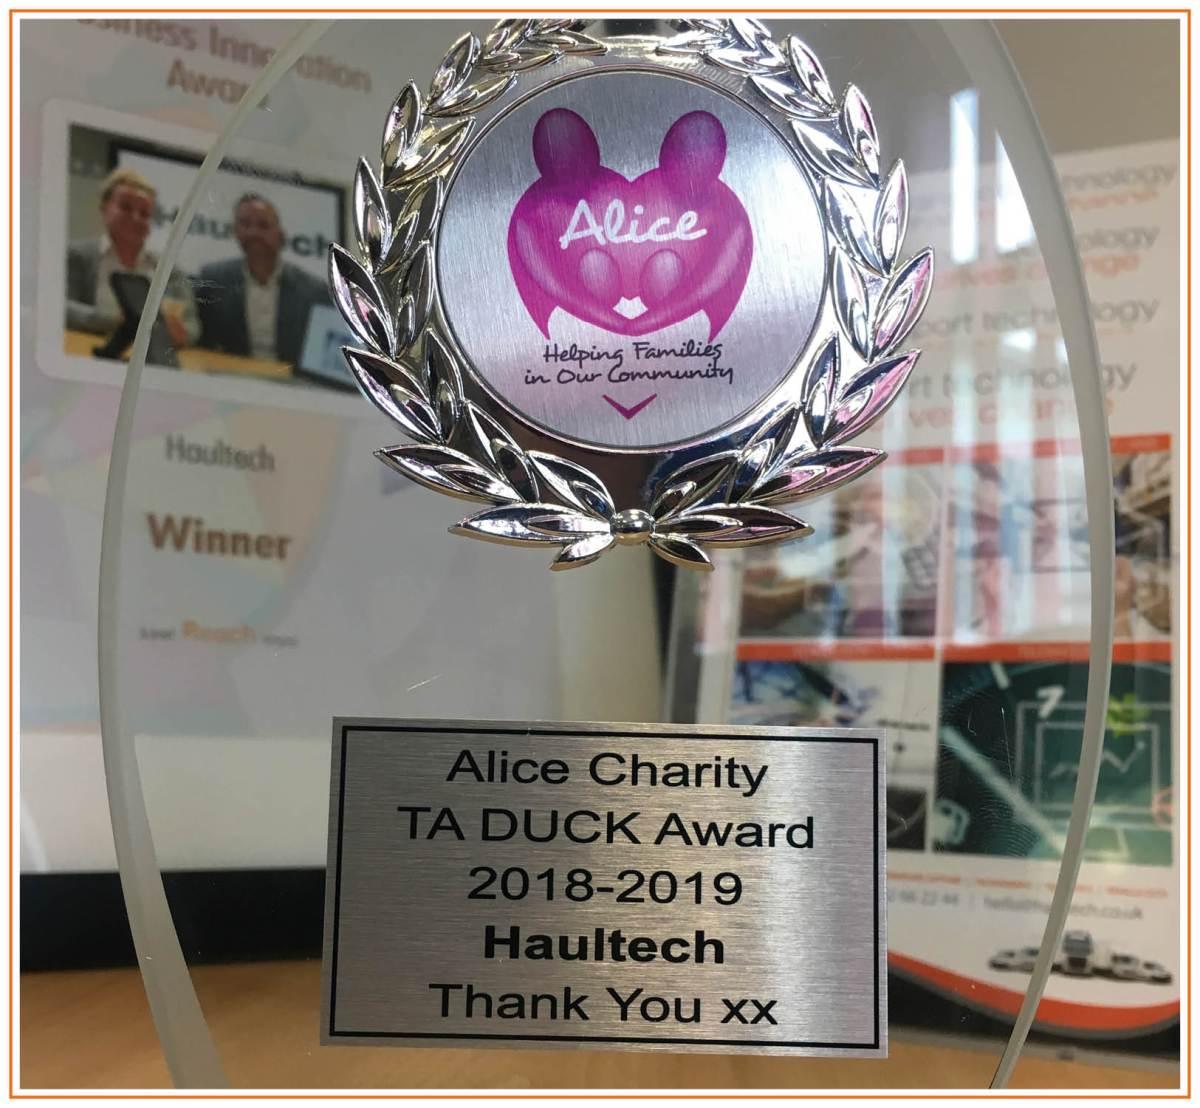 https://i0.wp.com/haultech.co.uk/wp-content/uploads/2019/04/Alice-Charity-Ta-Duck-2019-Award-Presented-to-HaulTech.jpg?fit=1200%2C1108&ssl=1